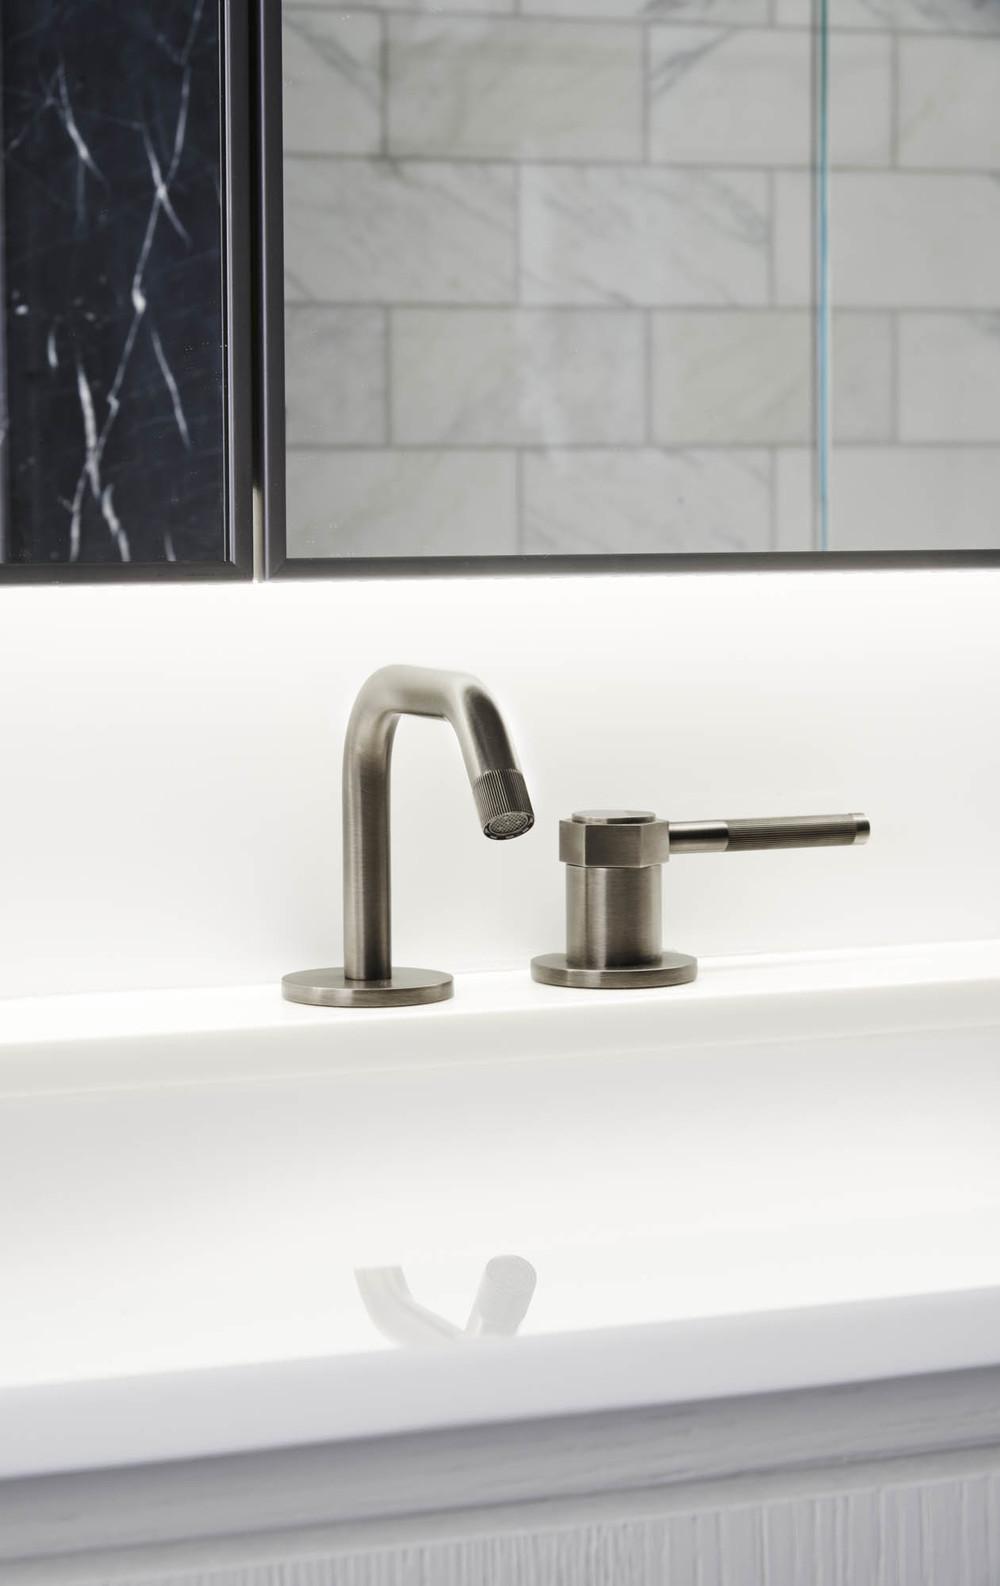 The Sutton Condominium Sales Office Sink and Faucet Detail